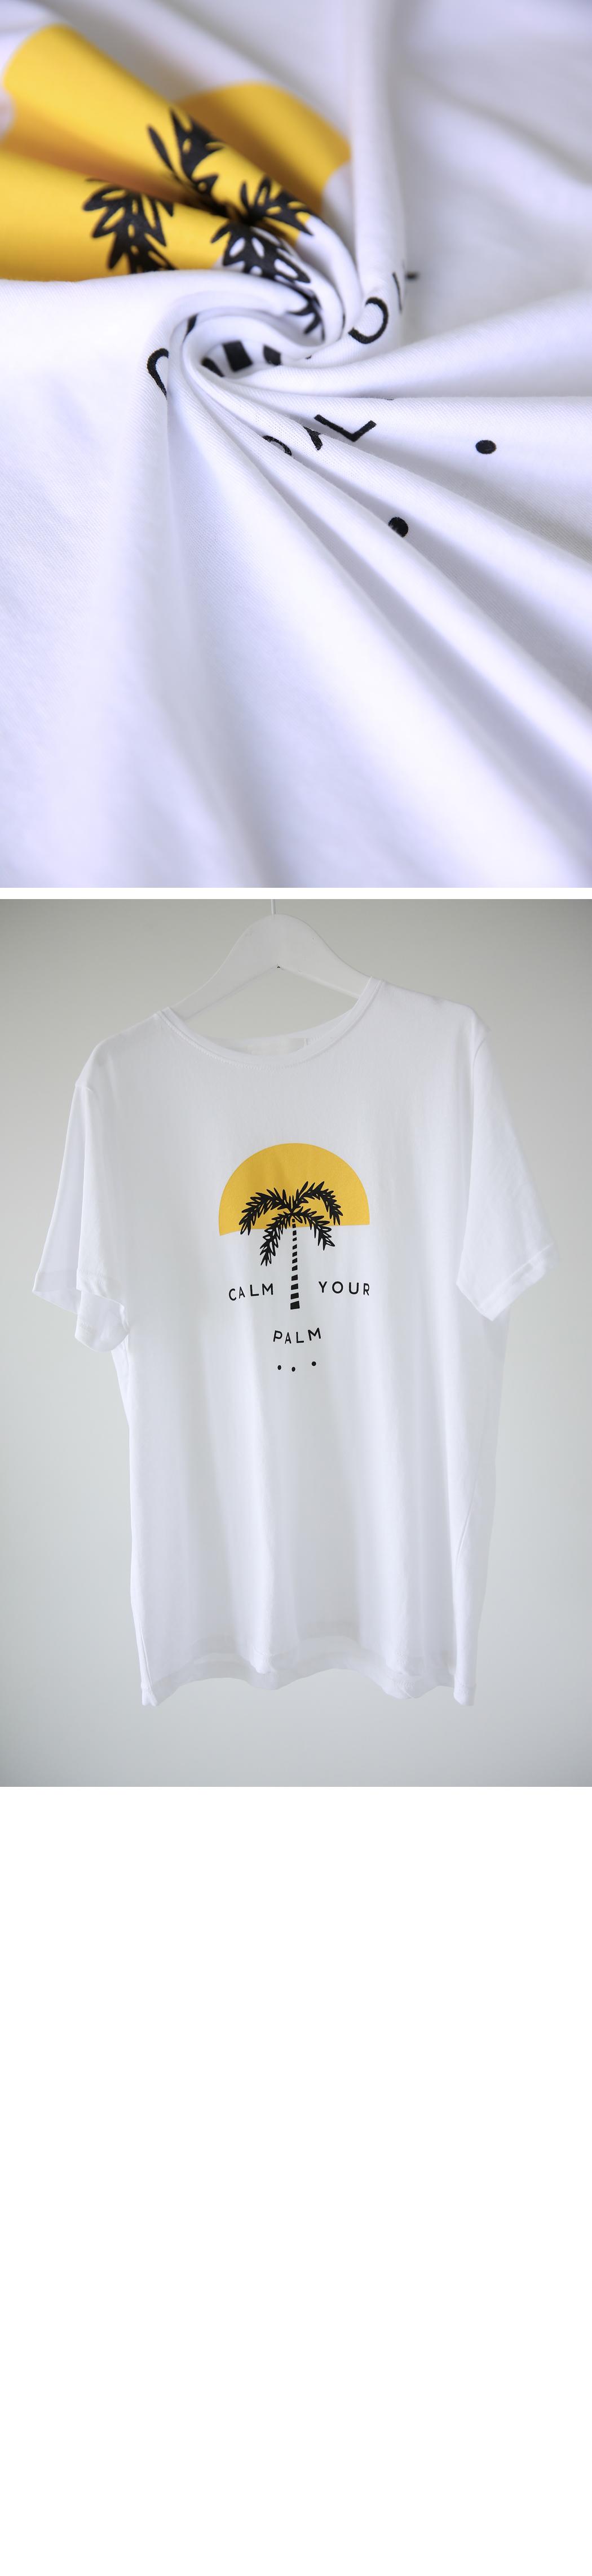 'Palm' printing tee